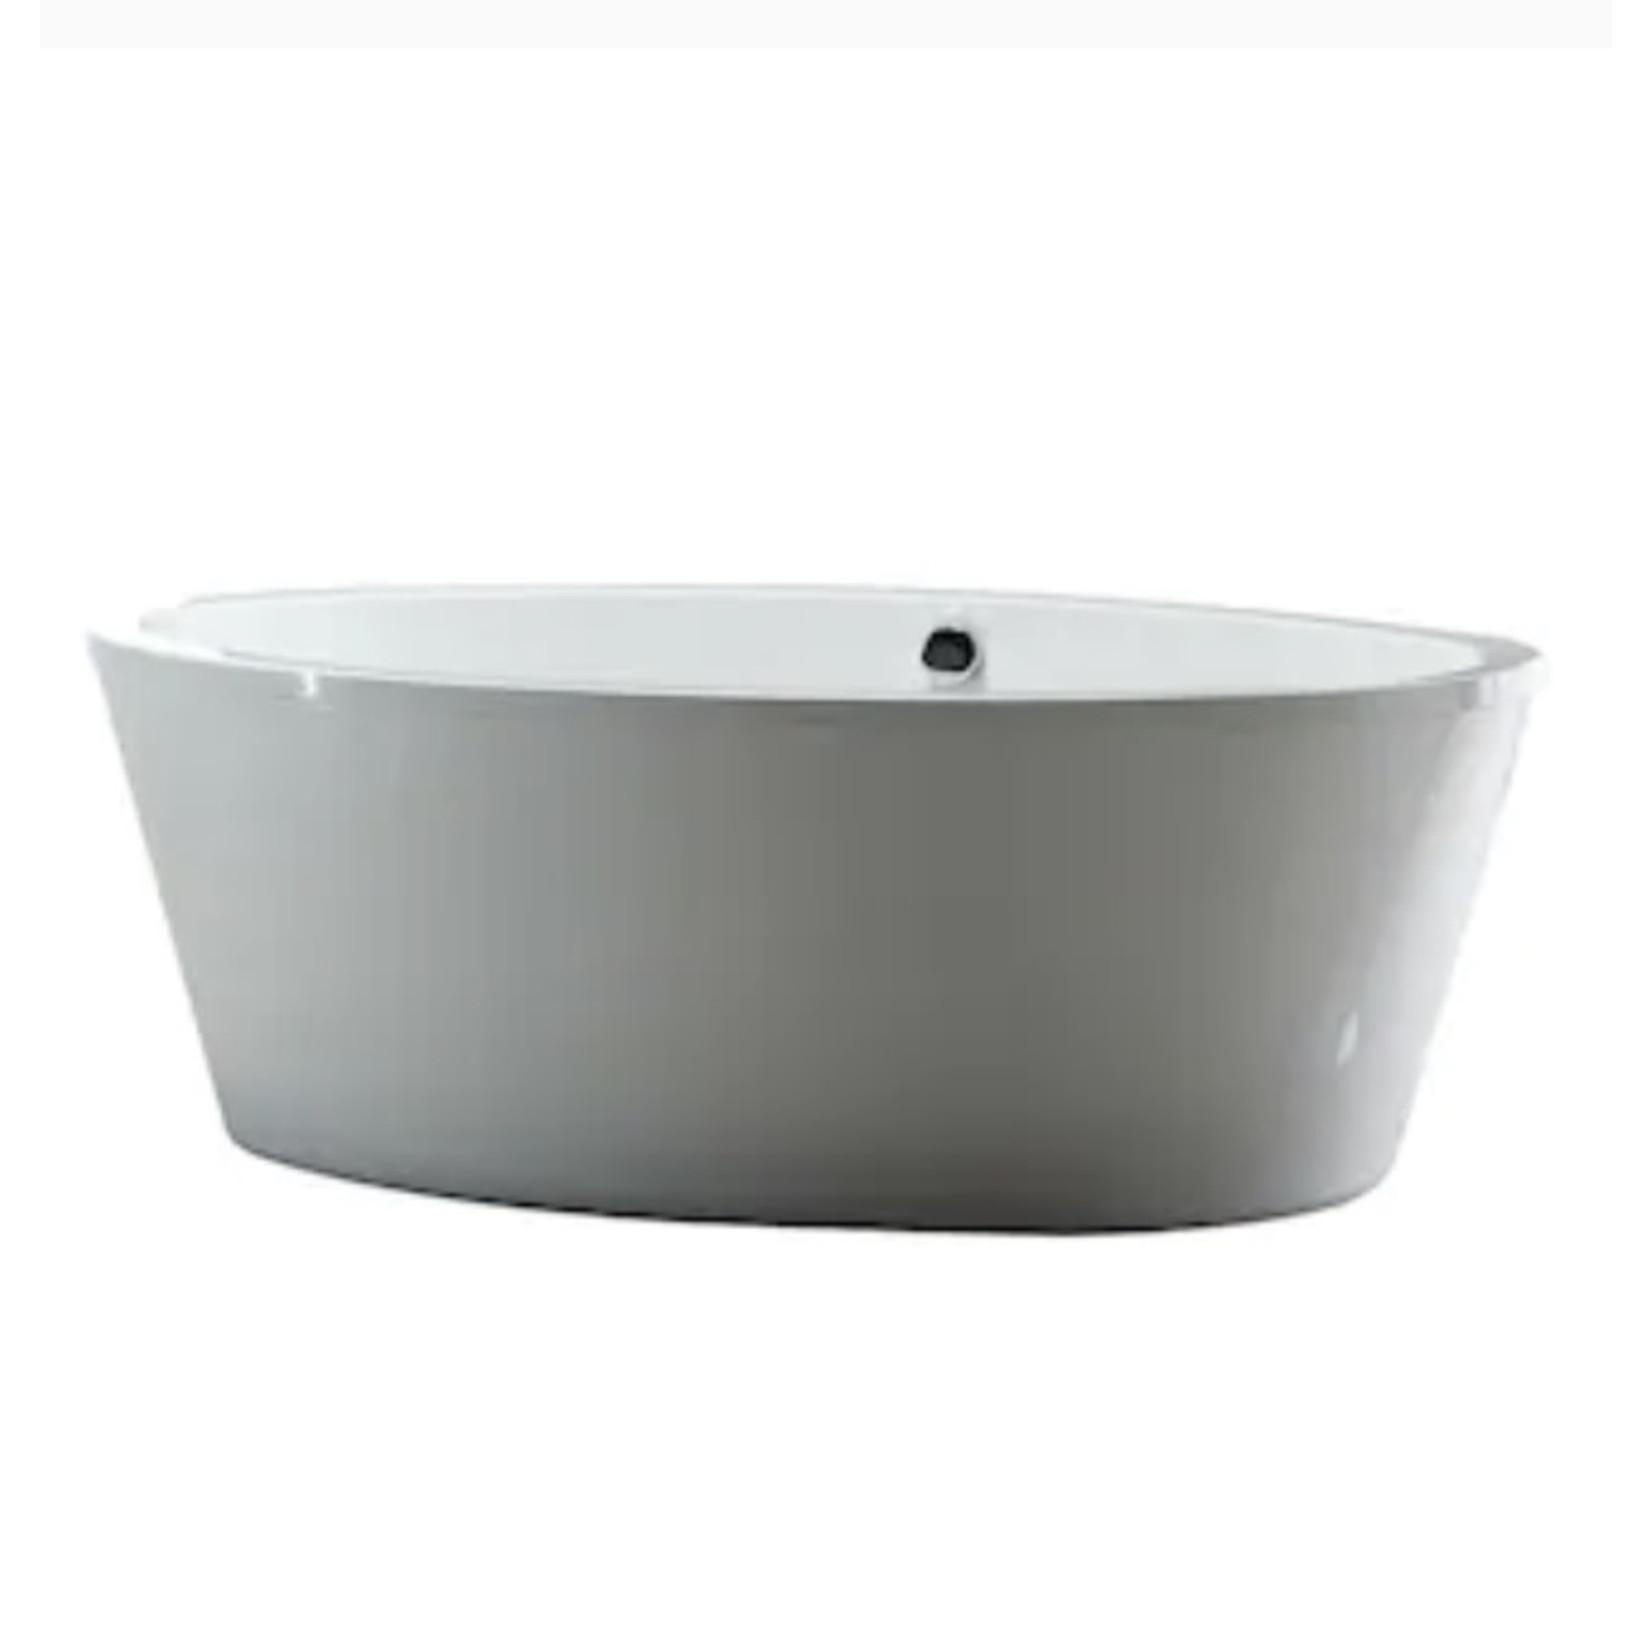 10426 Betsy Freestanding Bathtub